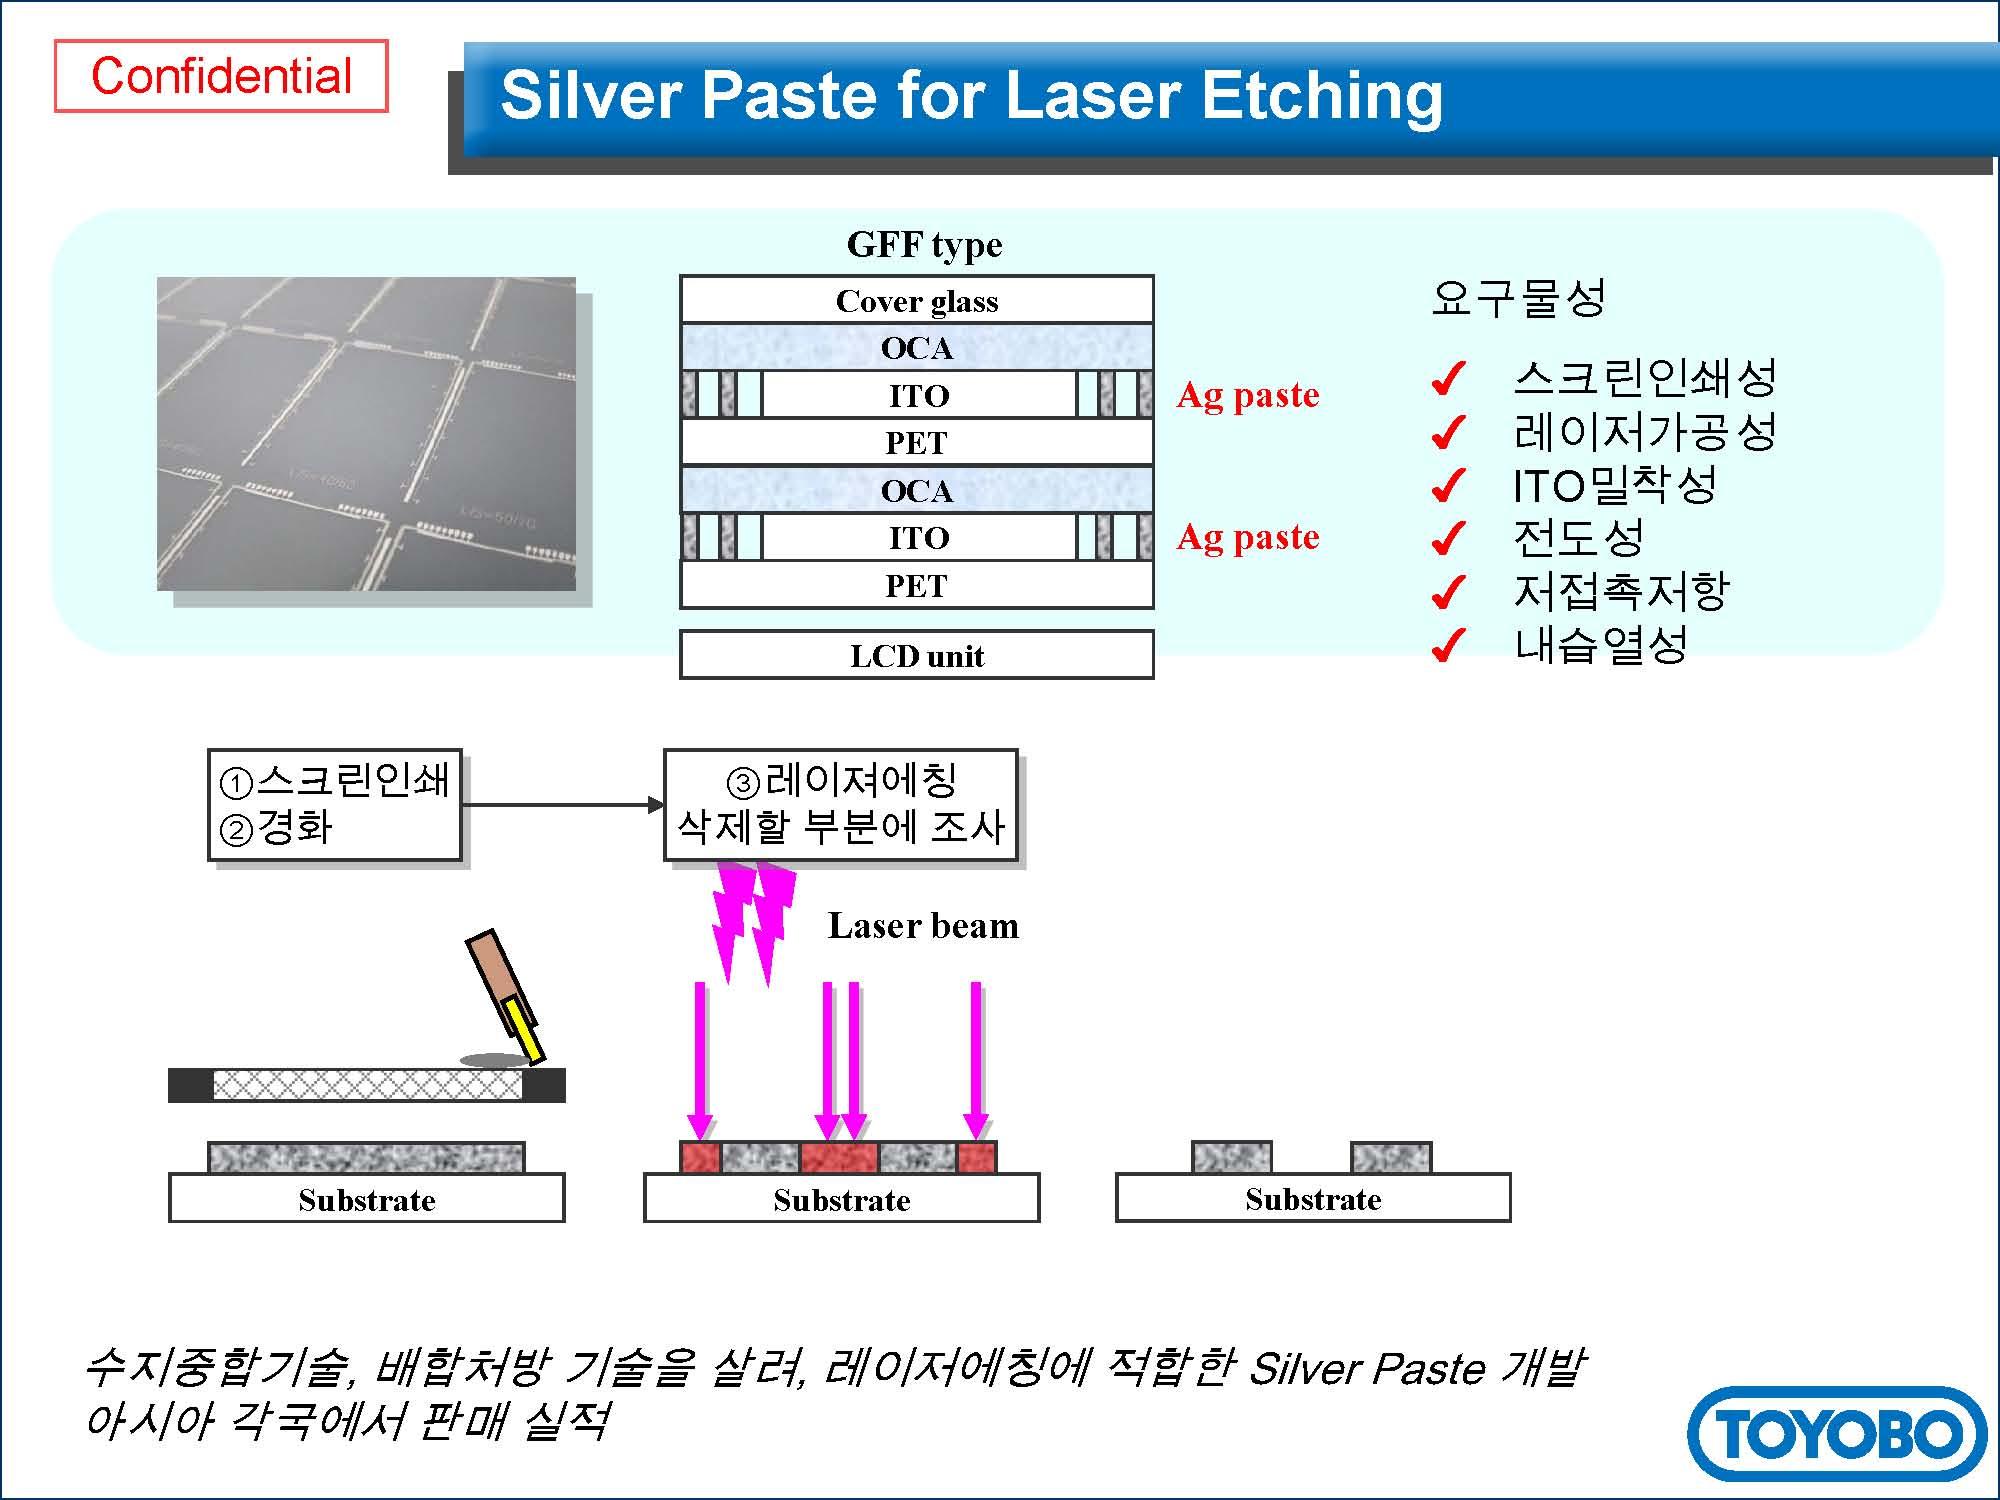 Vylon 소개자료(Silver Paste)_131217_Page_7.jpg